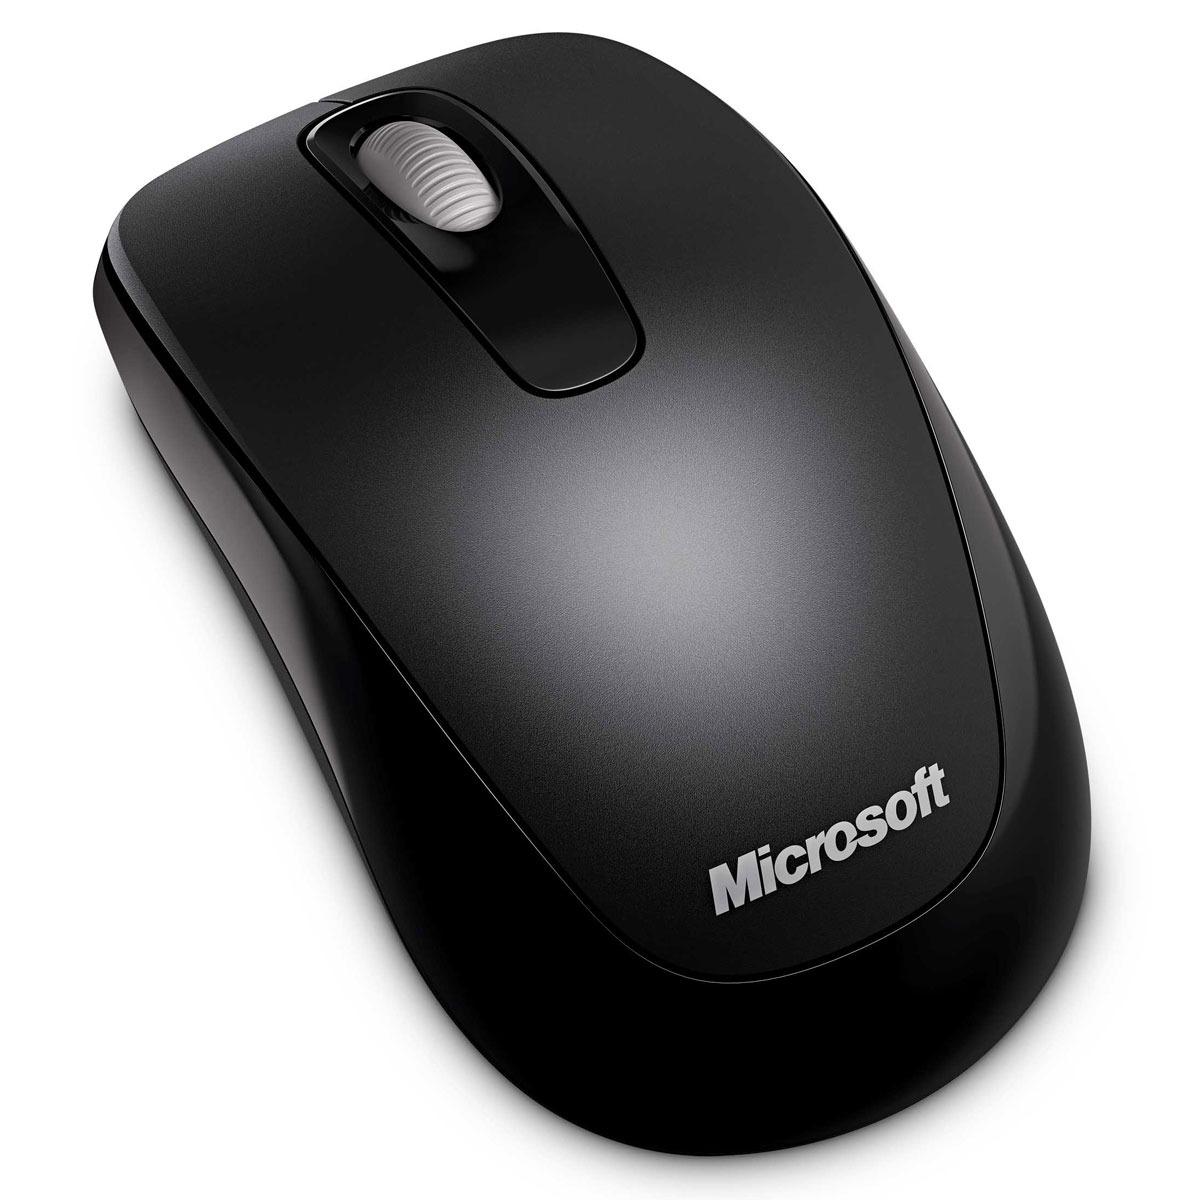 Souris PC Microsoft Wireless Mobile Mouse 1000 Microsoft Wireless Mobile Mouse 1000 - Souris sans fil (coloris noir)